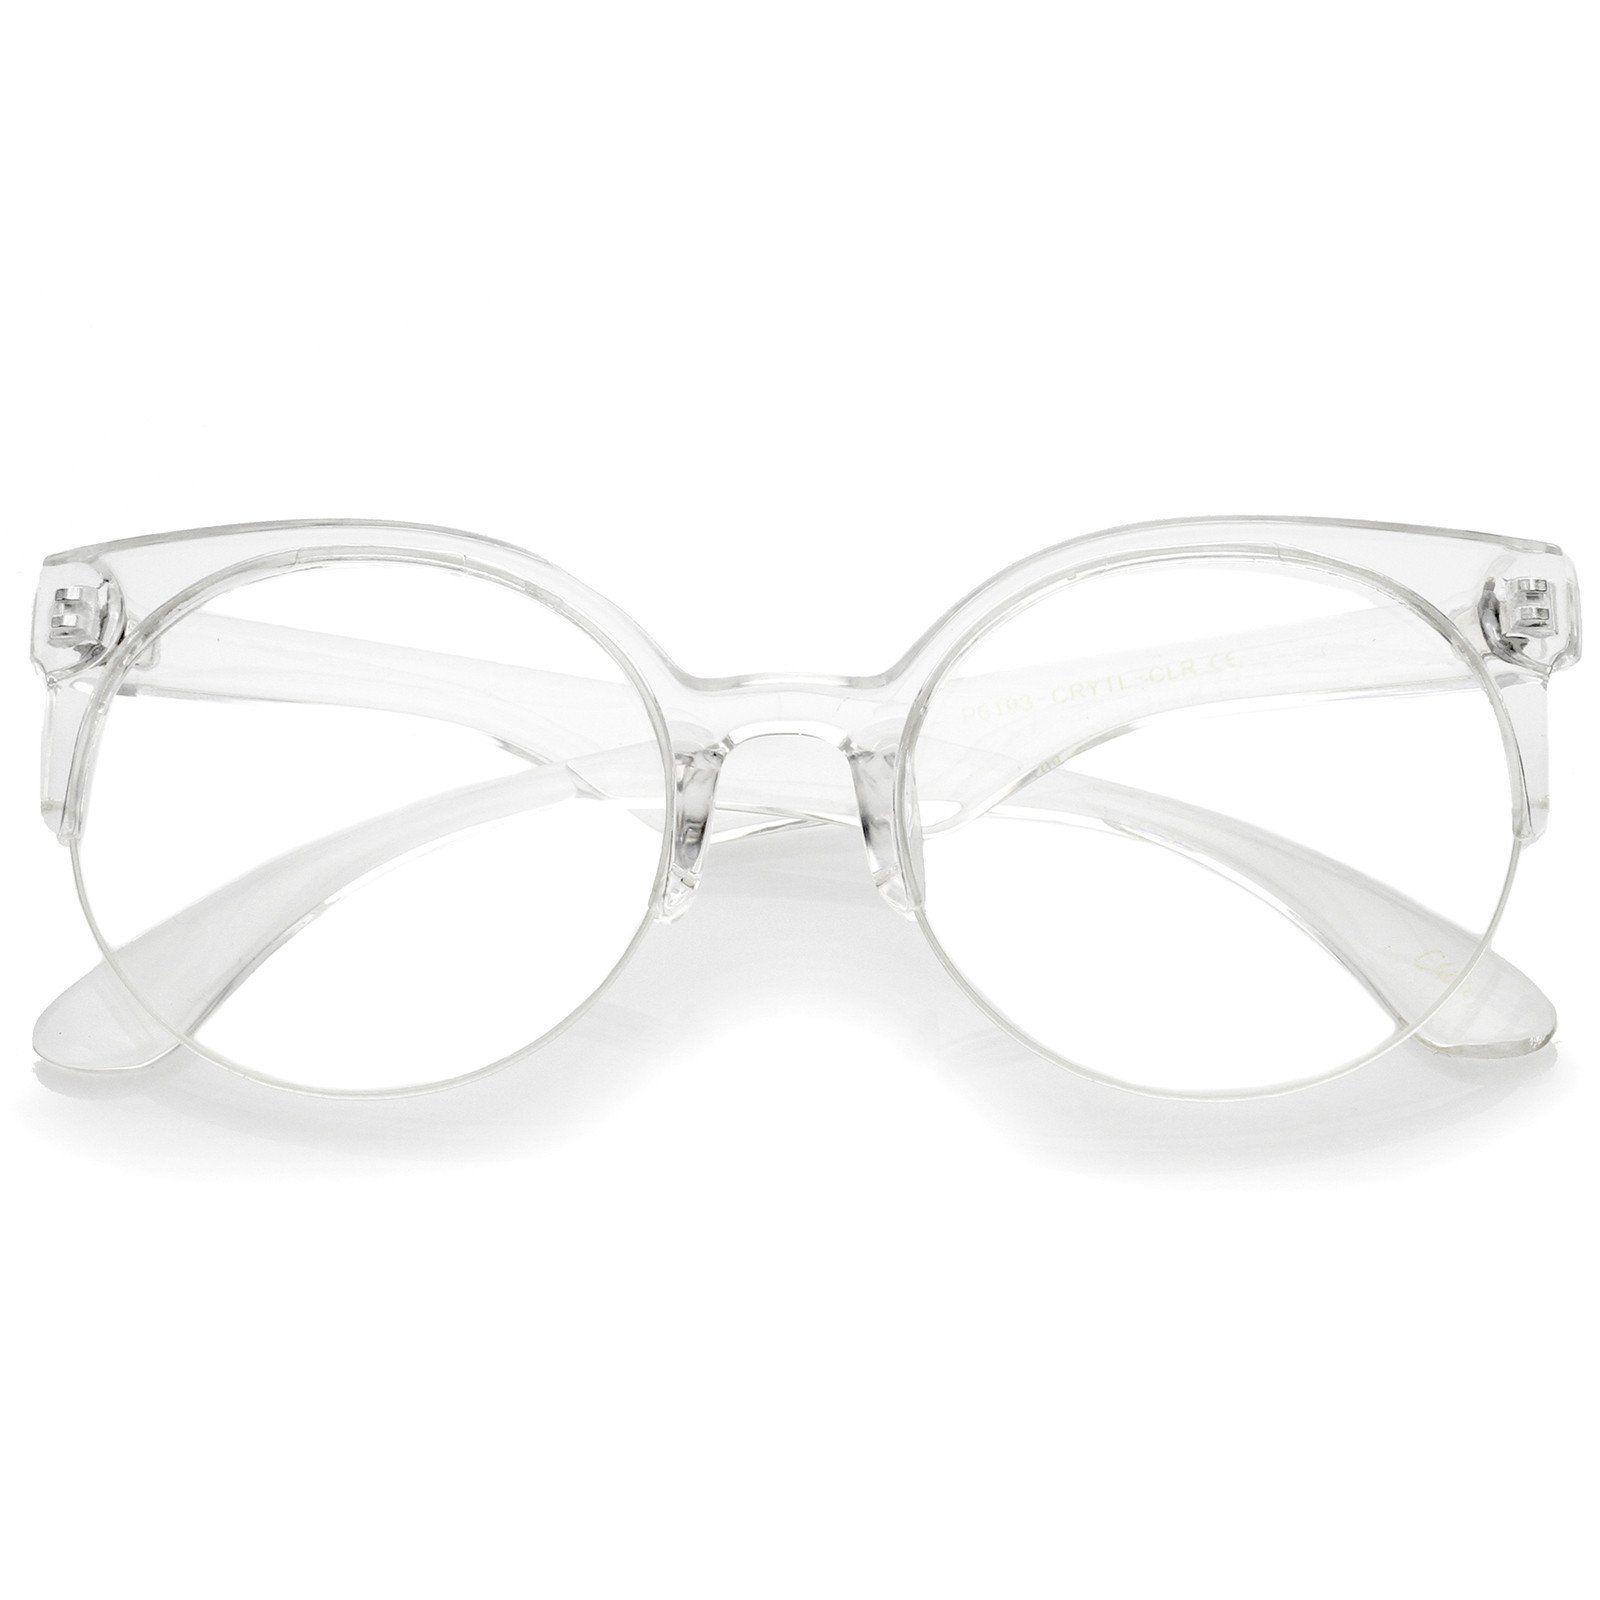 Modern Translucent Frame Round Clear Lens Semi-Rimless Eyeglasses ...